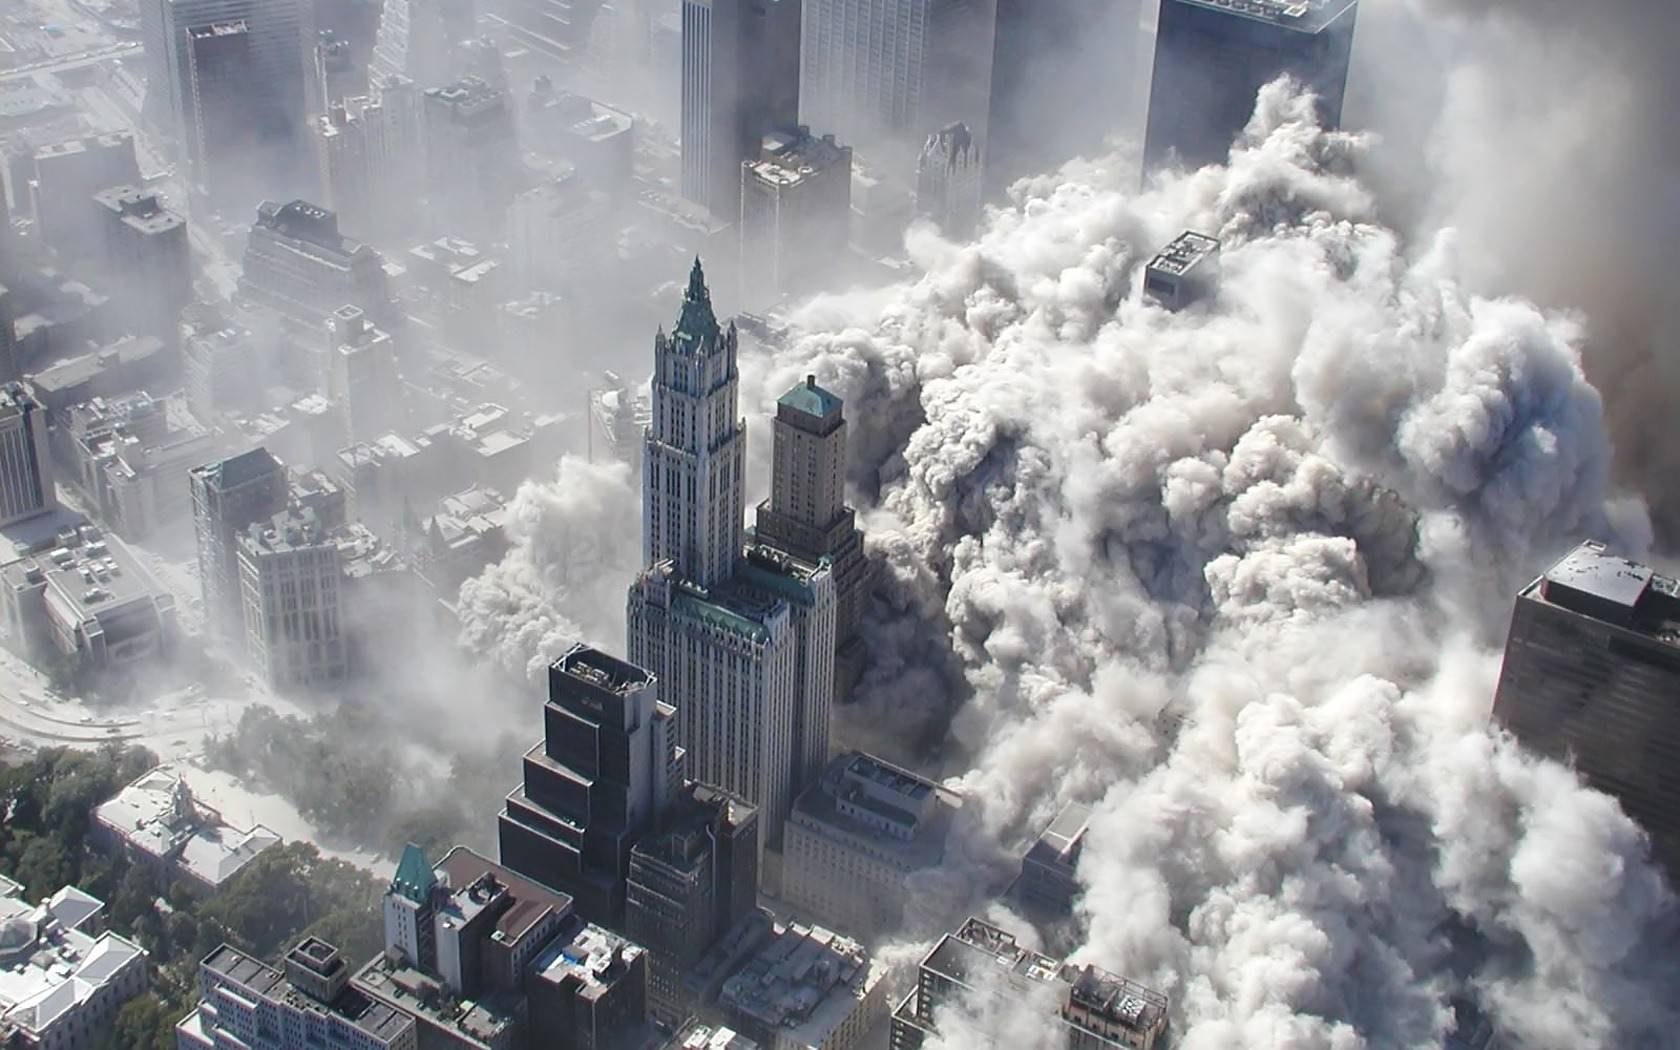 احداث 11 سبتمبر (4)